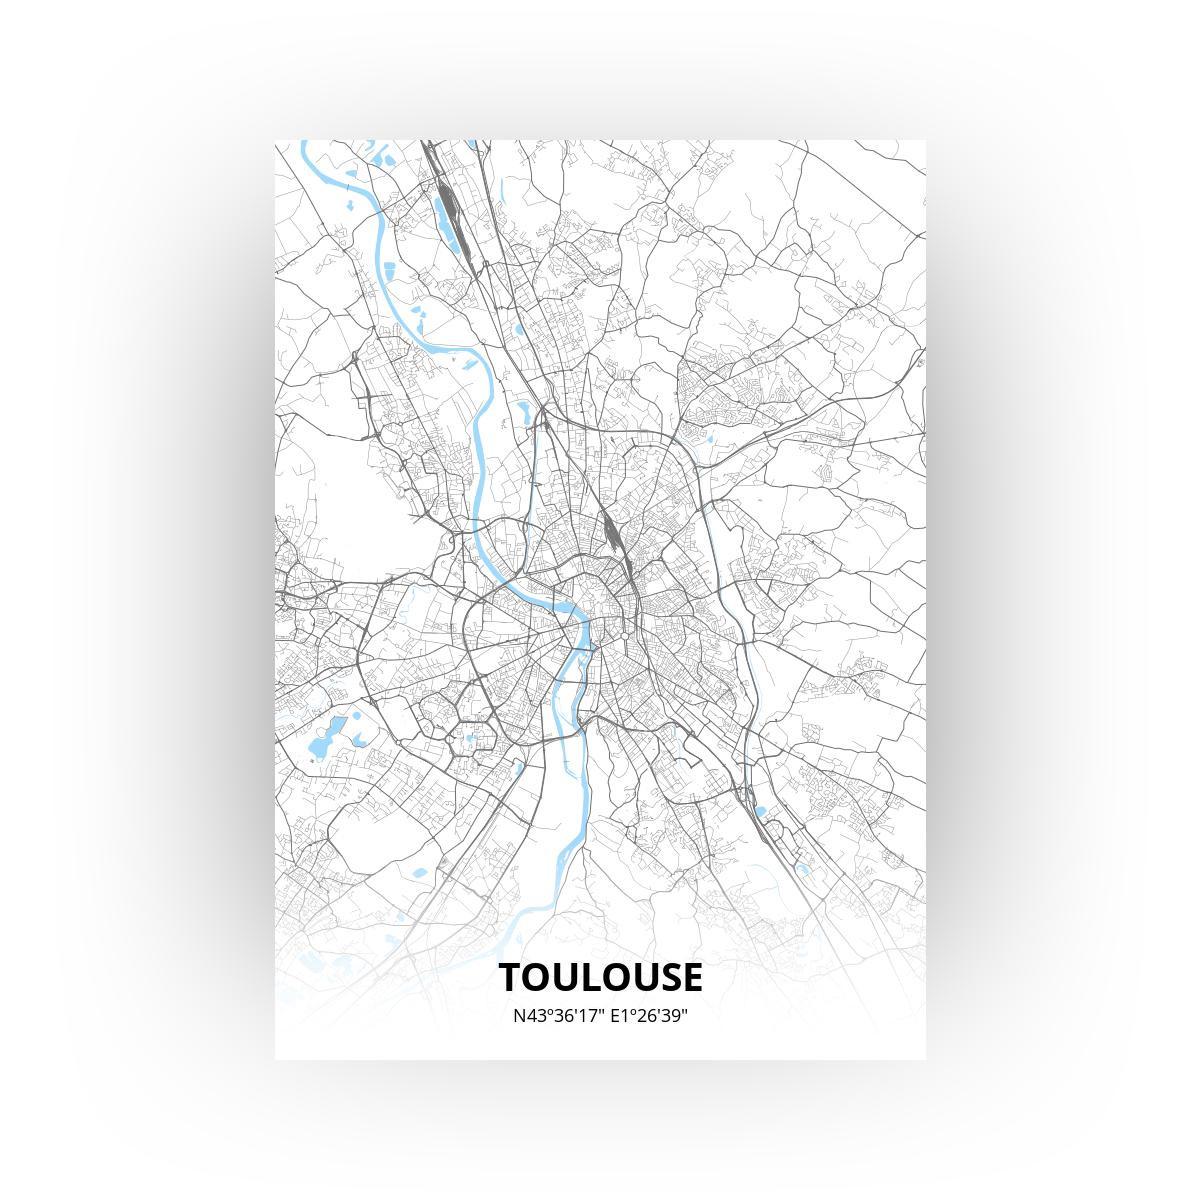 Toulouse print - Standaard stijl